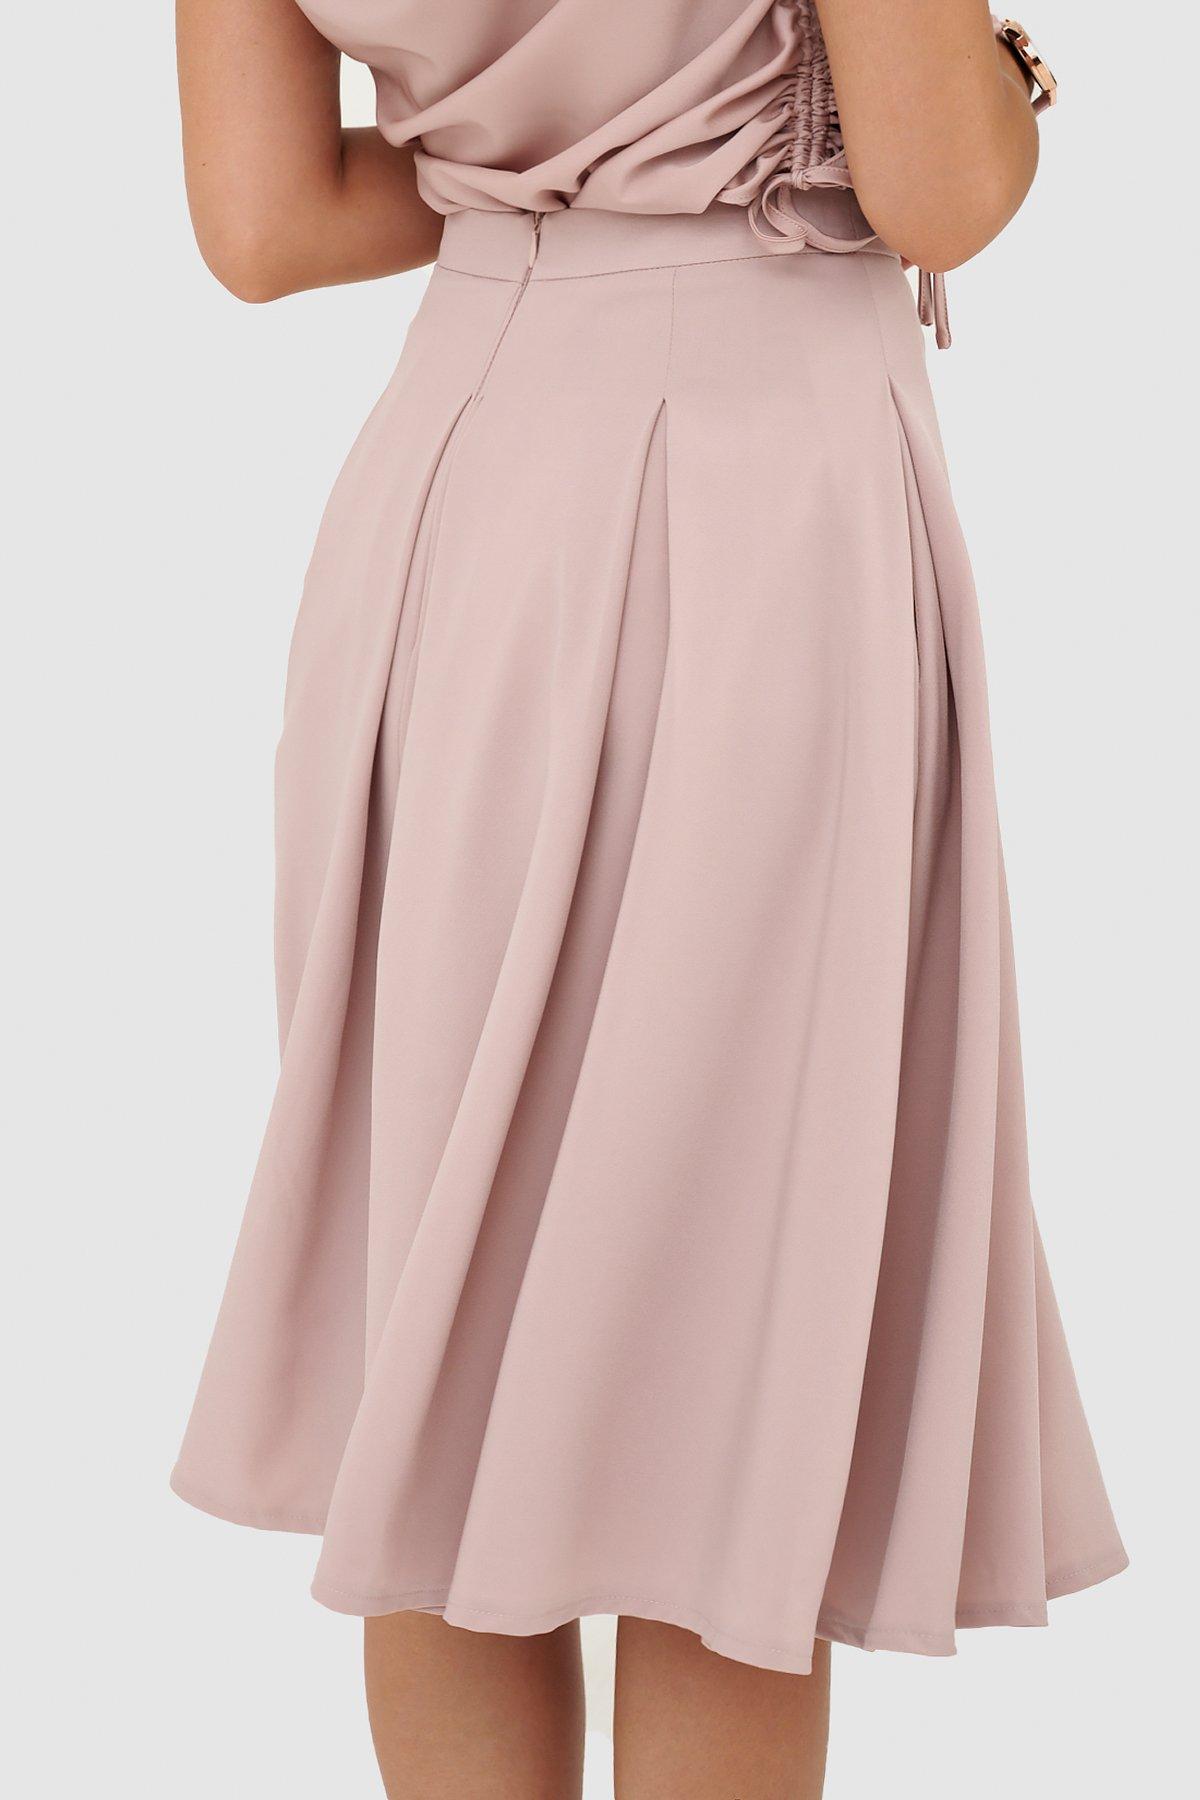 Váy midi xếp li hợp